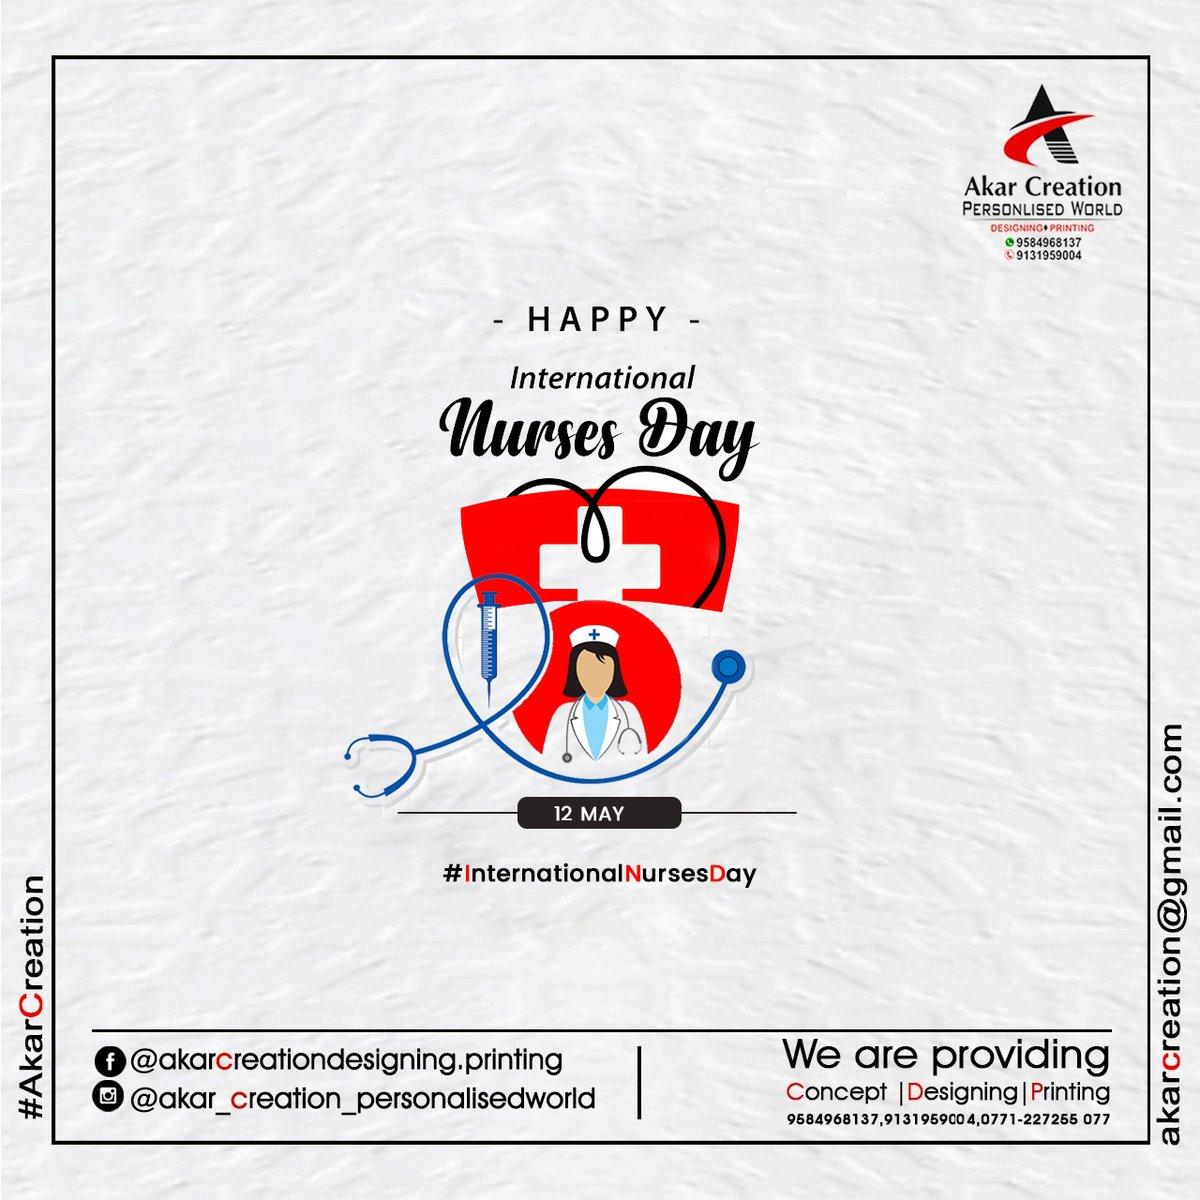 Happy International Nurses Day #internationalnursesday #nursesday #AkarCreation #Concept #Designing #Printing #Advertising #Raipur #Chhattisgarh #graphicdesigner Kunwar Singh Rajput Call Now - 9131959004,9584968137